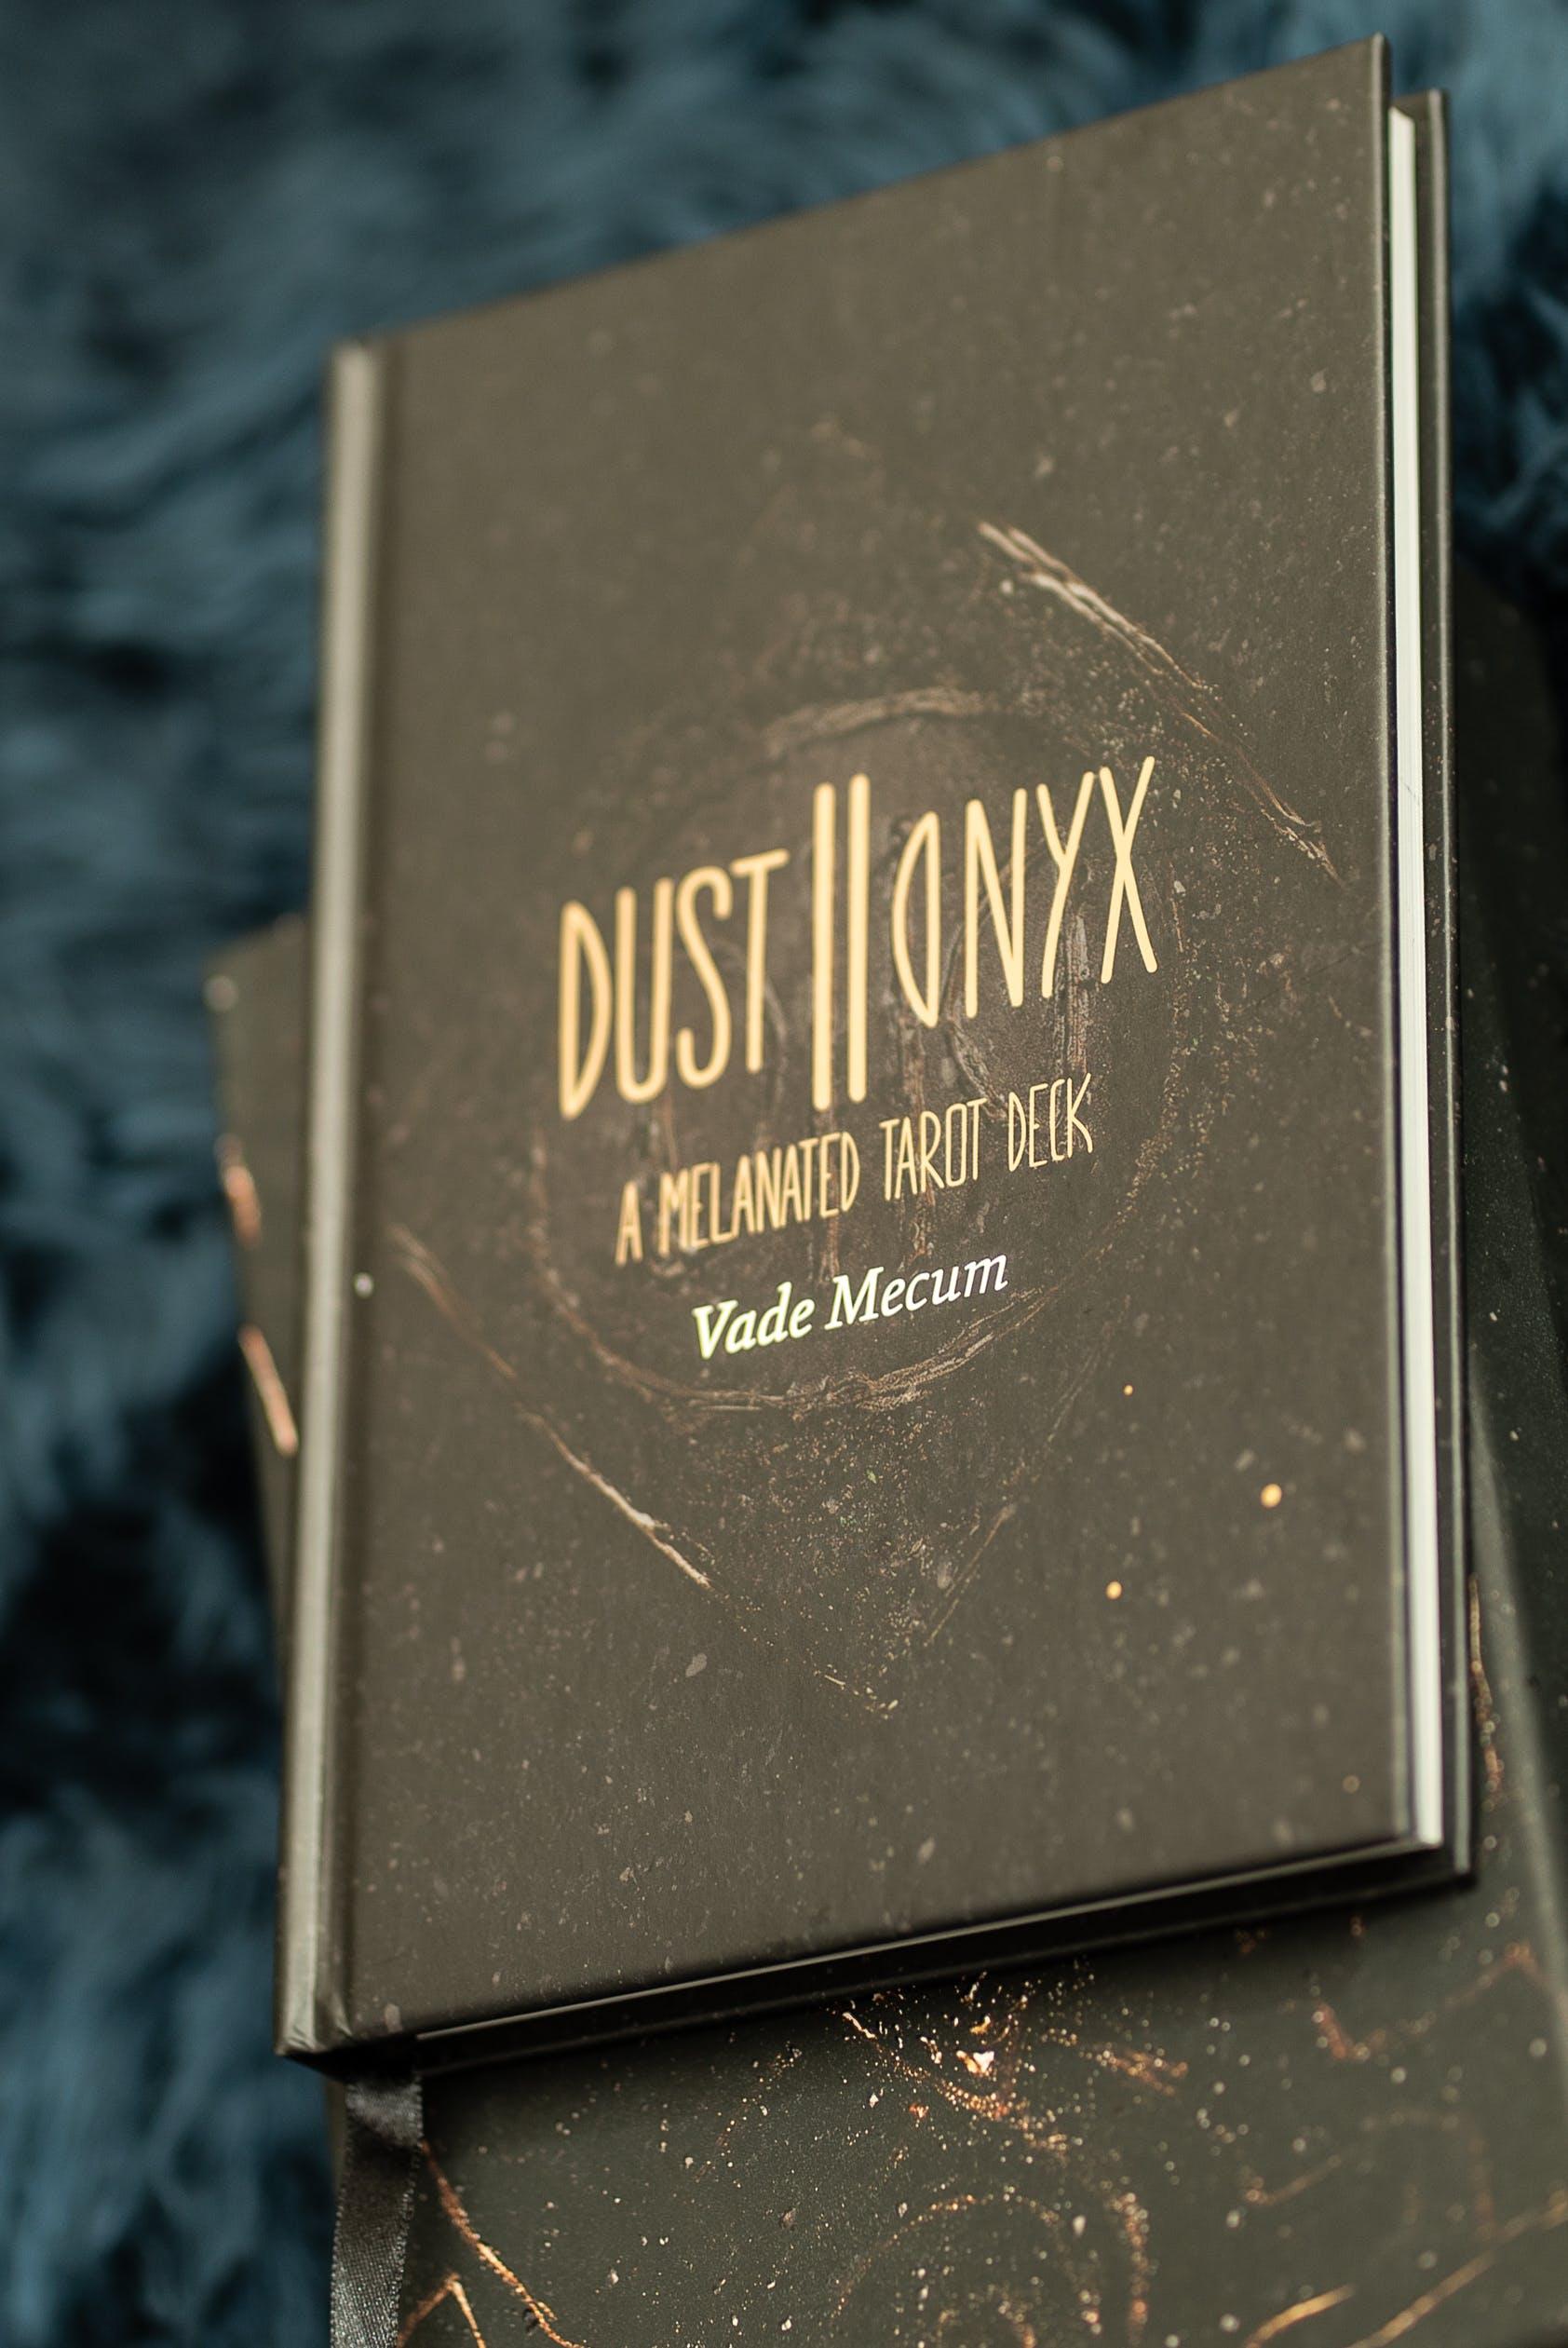 Dust II Onyx: A Melanated Tarot - 2nd Edition